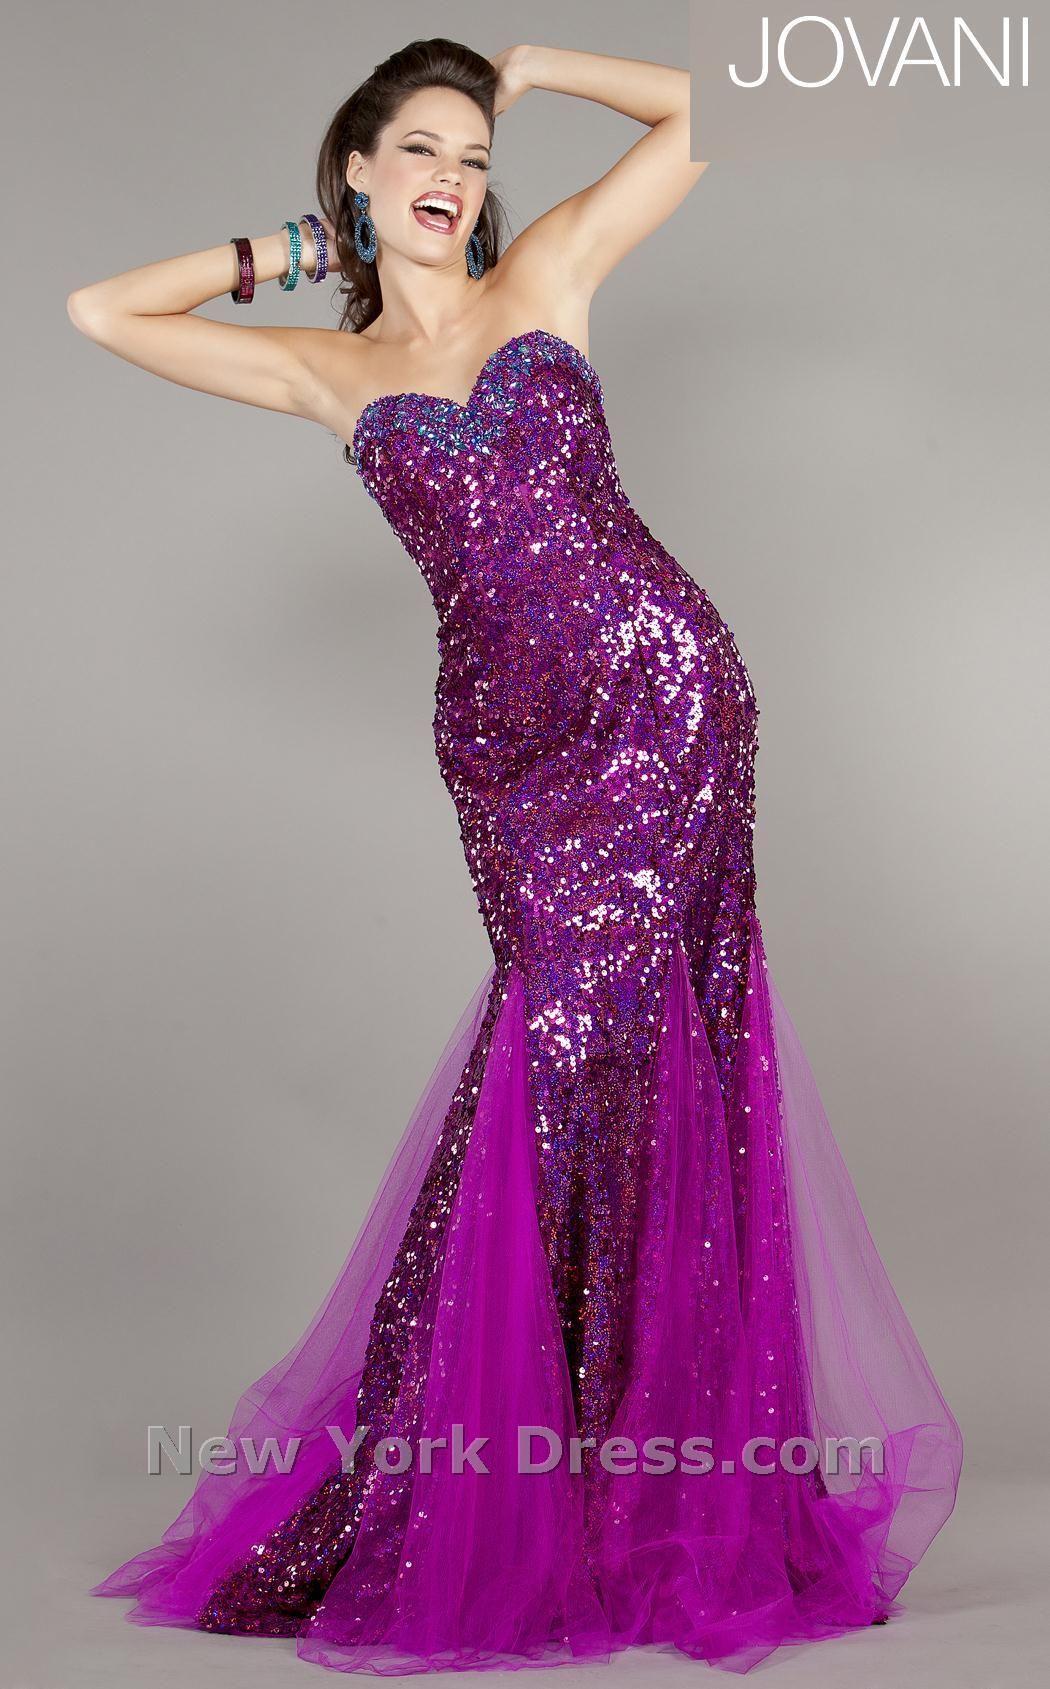 Jovani dress shop newyorkdress at newyorkdress or follow our